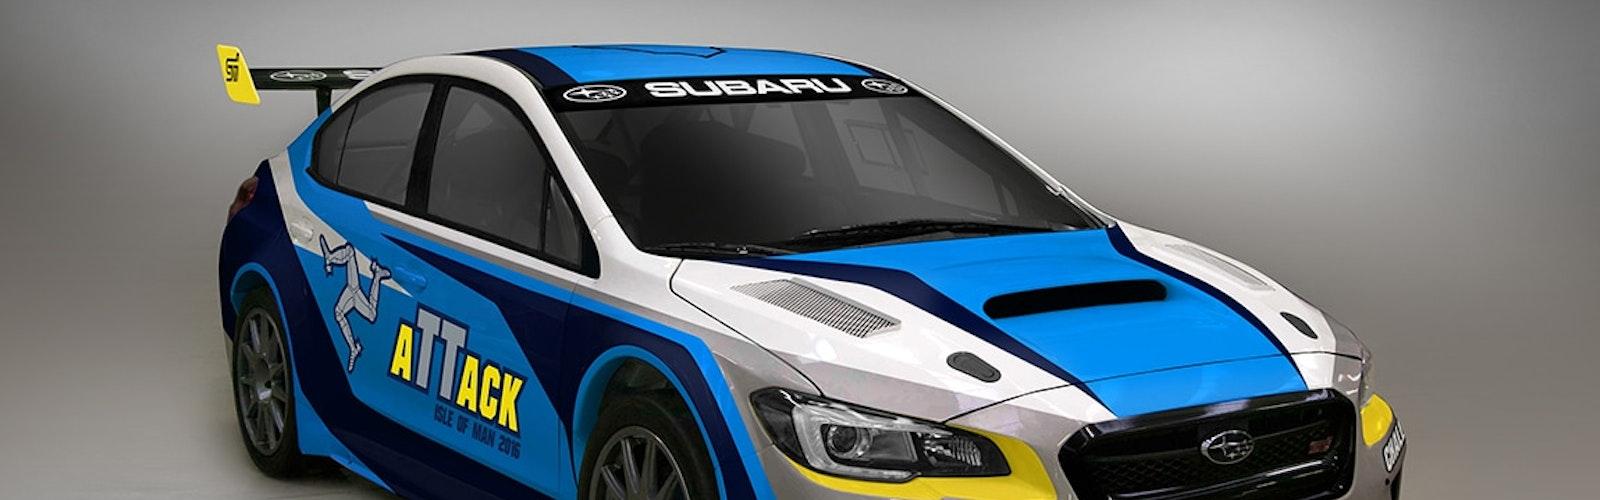 Subaru_front_3_qtr_(3)_FINAL-2